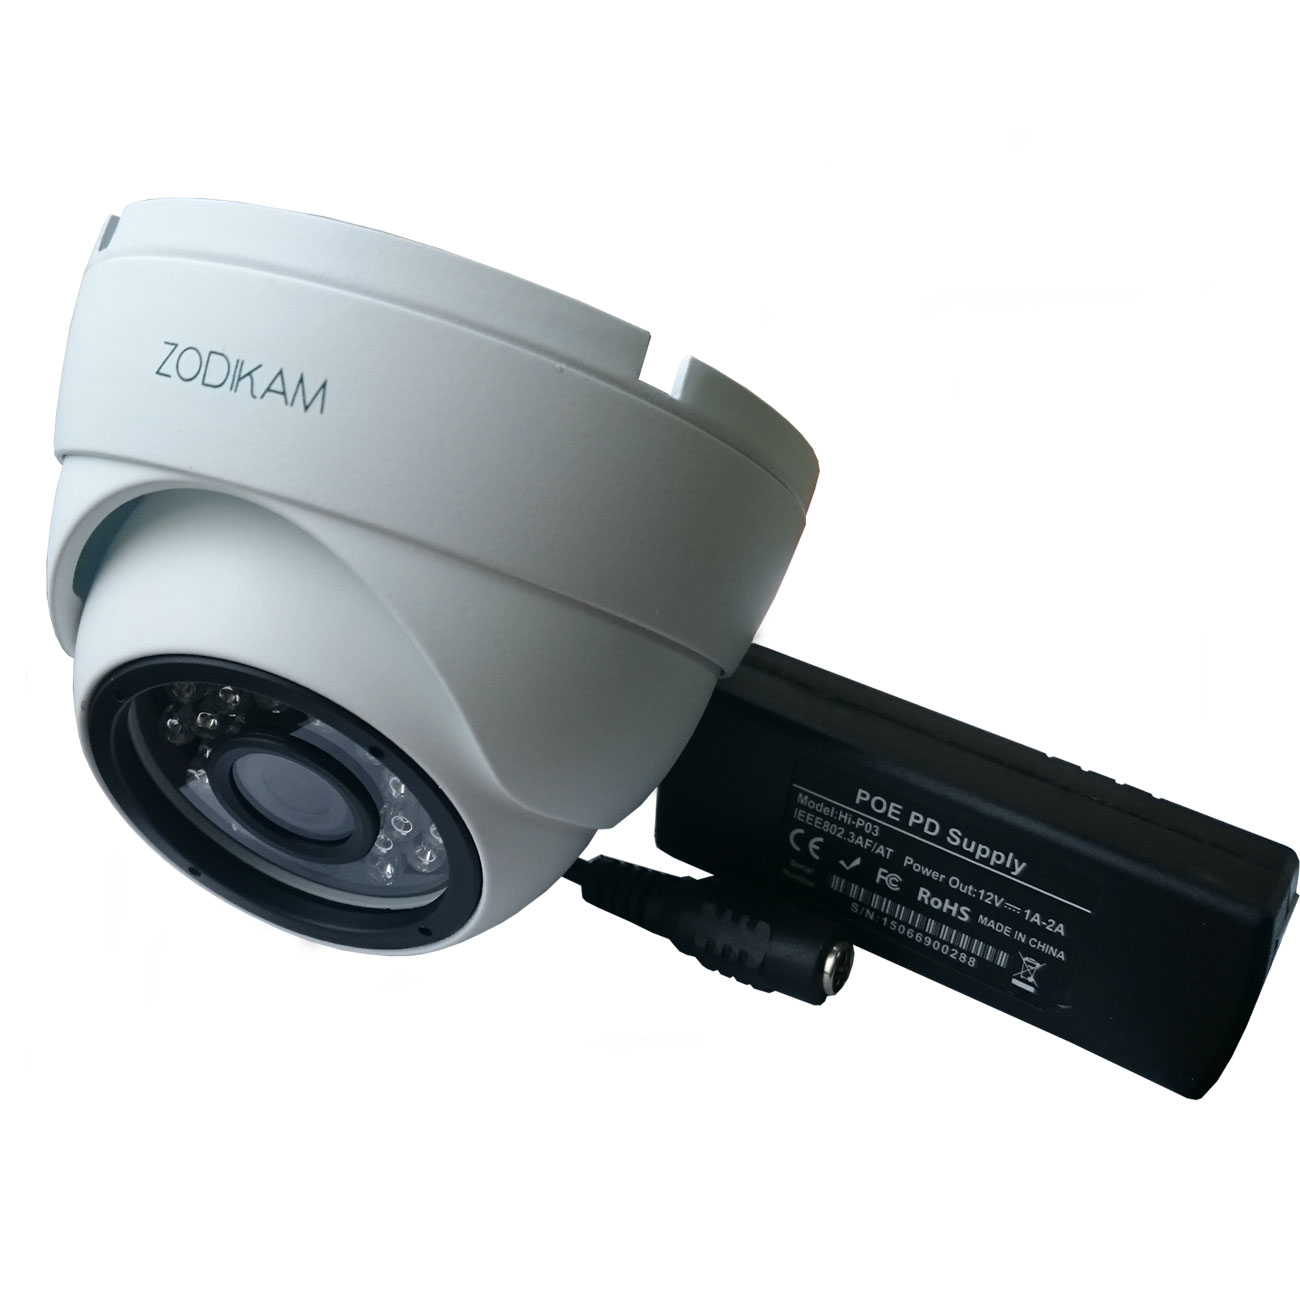 IP камера Zodikam 3242-P, белый